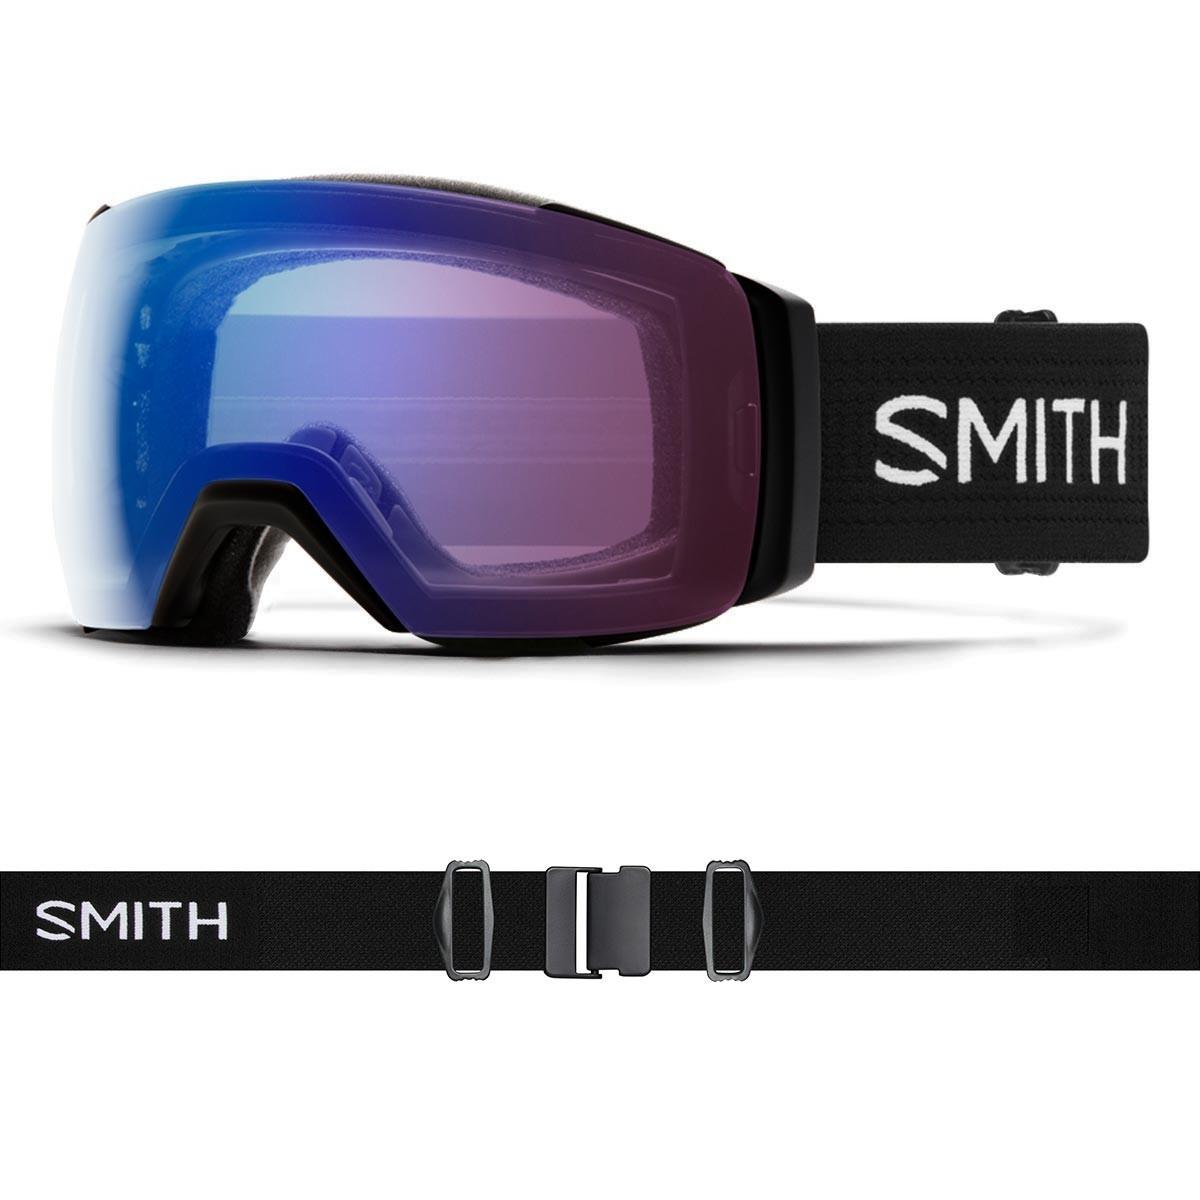 SMITH IO MAG XL black | S2-S1 CHROMAPOP Photochromic Rose Flash - Изображение - AQUAMATRIX